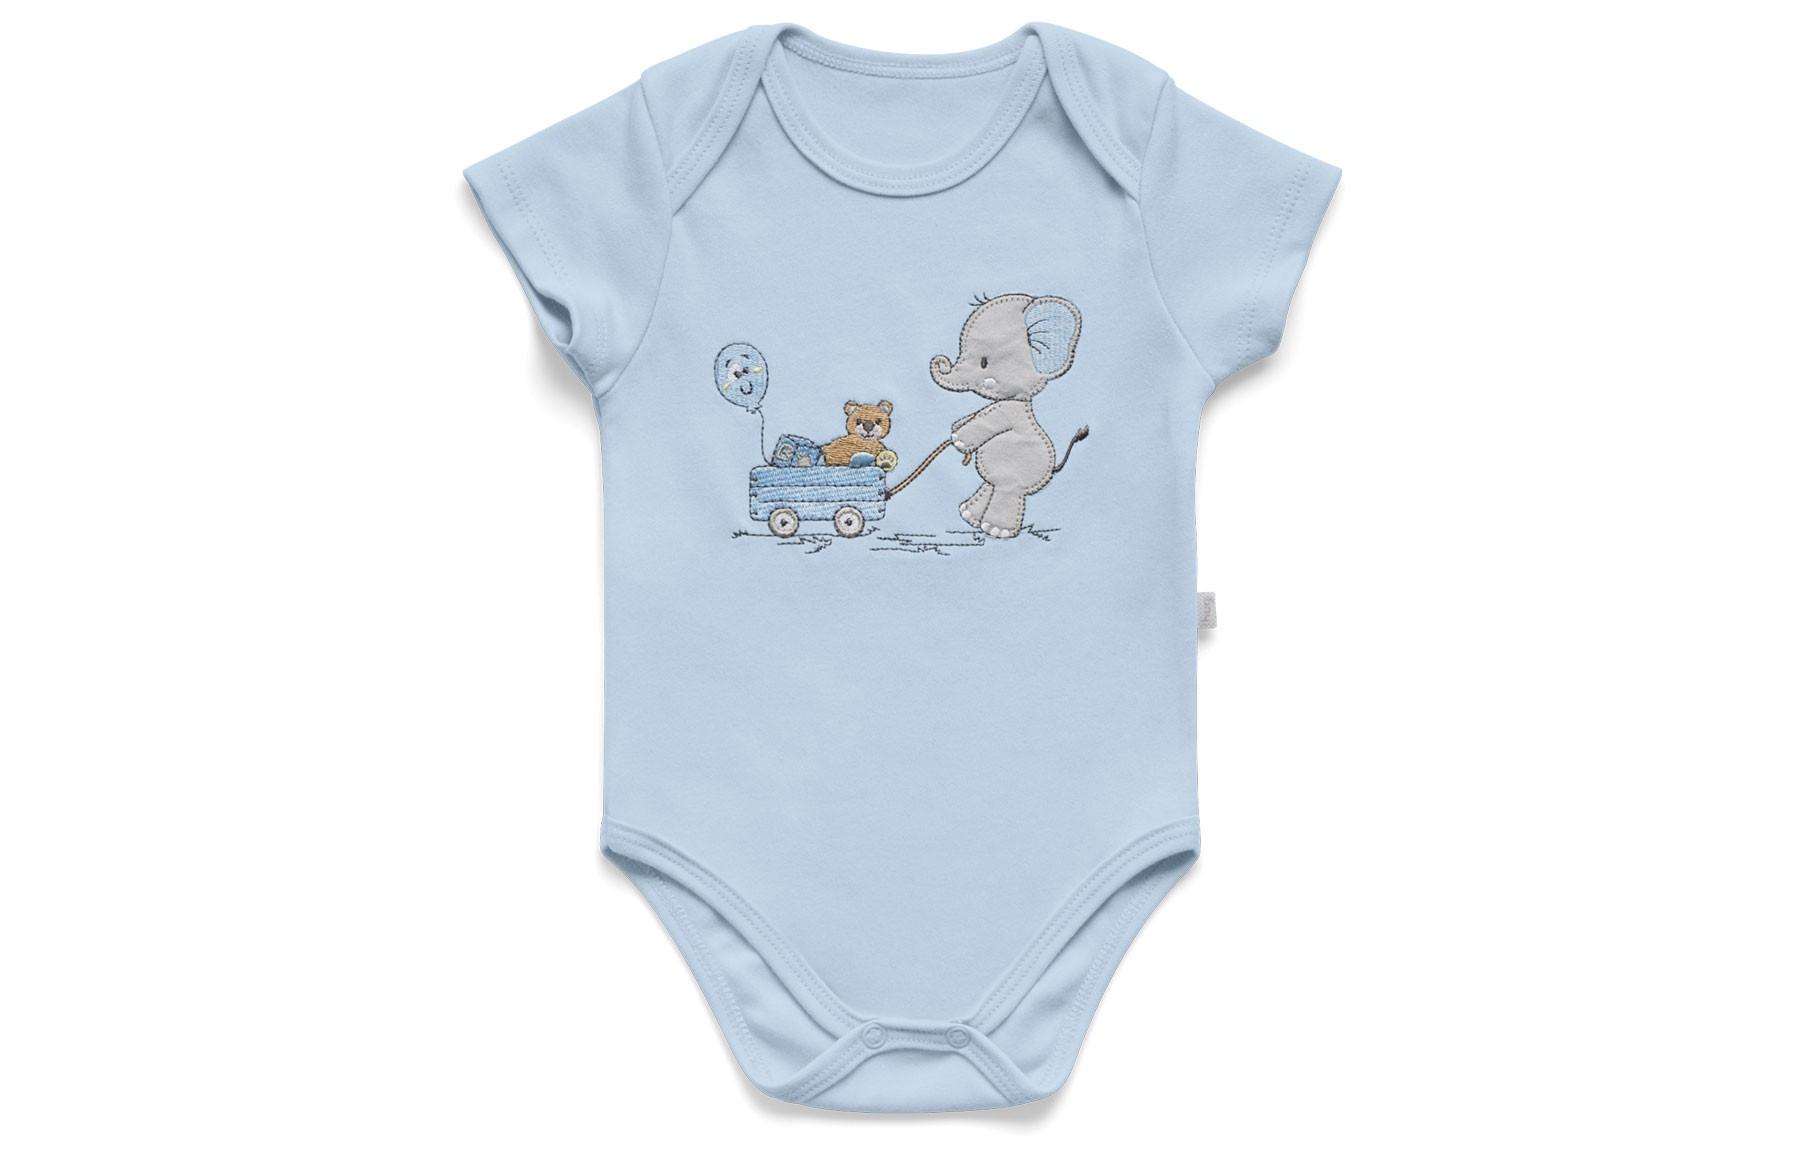 Conjunto Body Curto + Tapa Fralda - Lembrança de Infância Azul